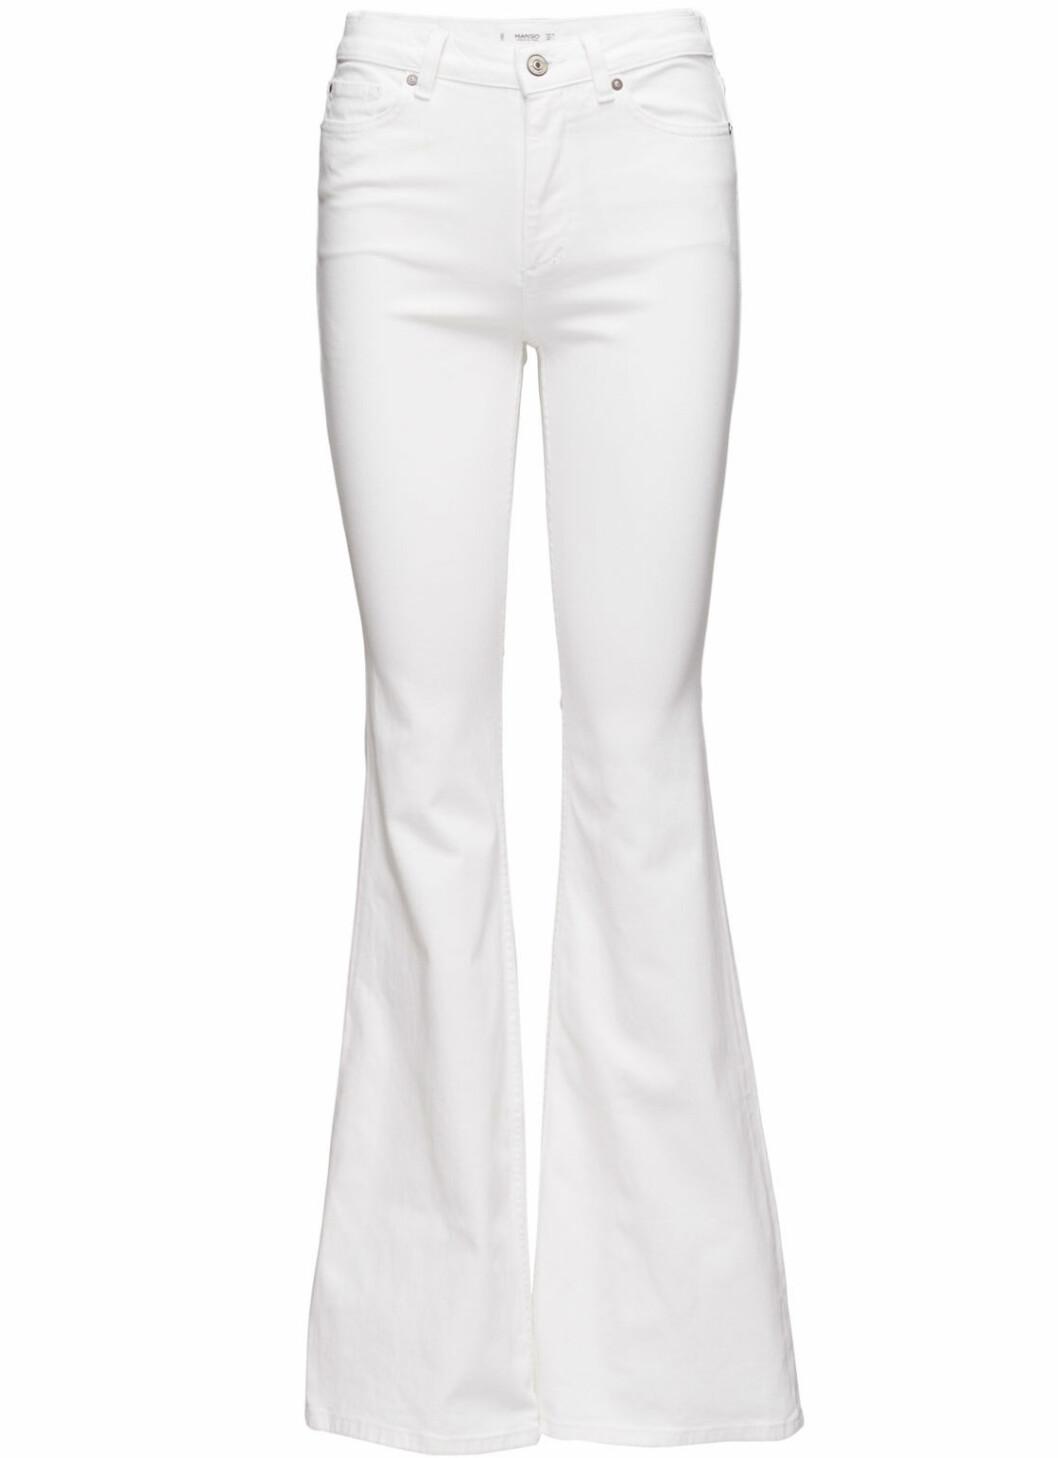 vita utsvangda jeans